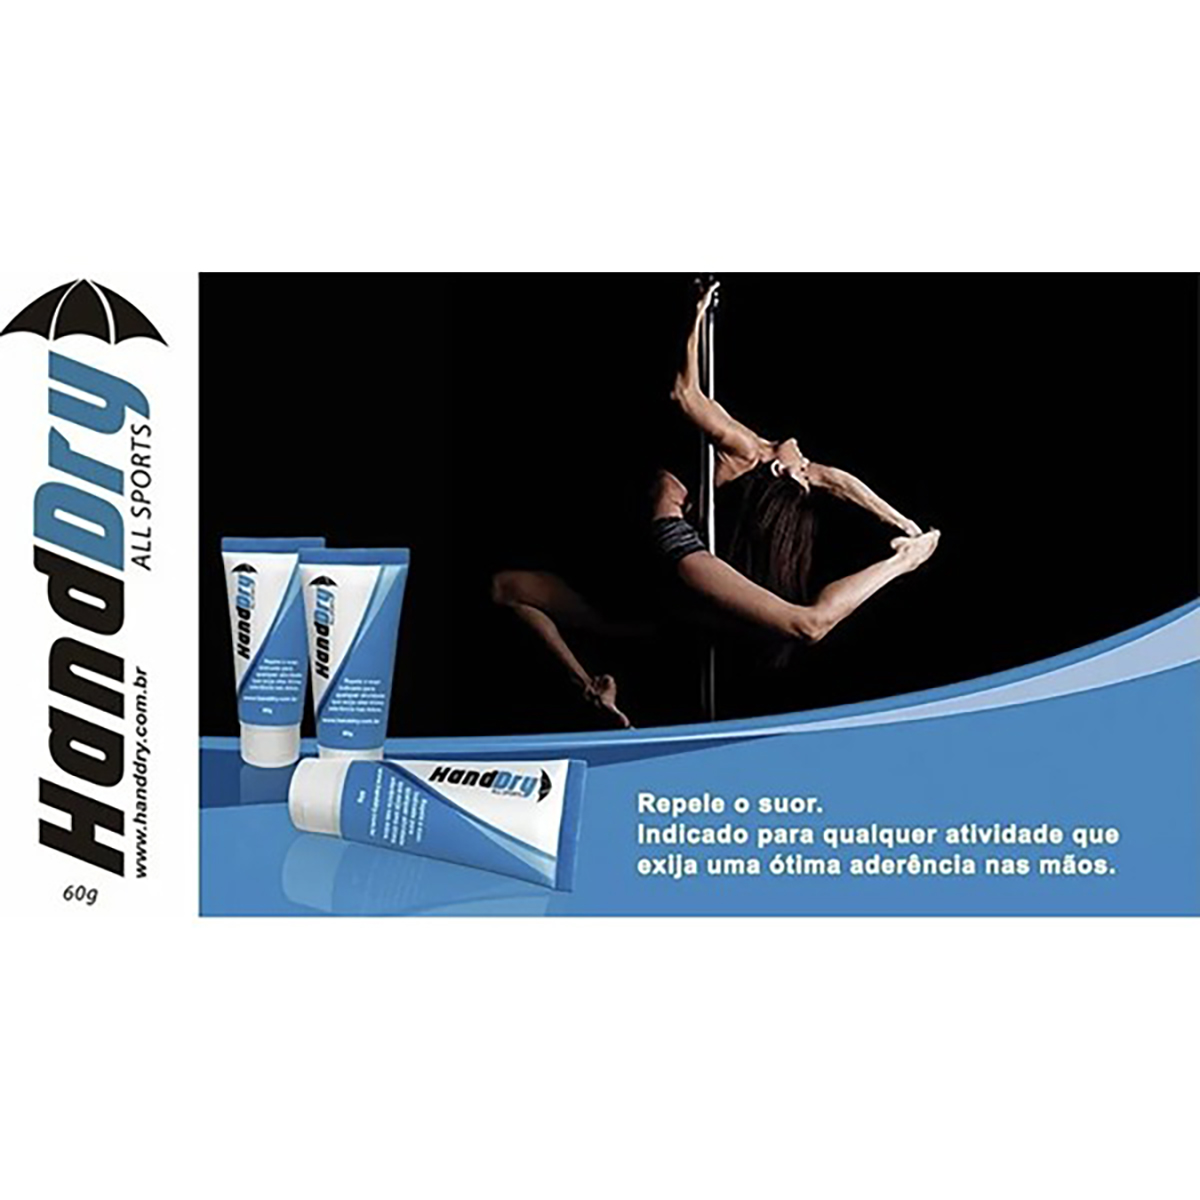 Hand Dry (Combo 2 unids) - Gel Anti-transpirante (Tenis, Squash, Tenis, Bech tenis, Poli dance, CrossFit)